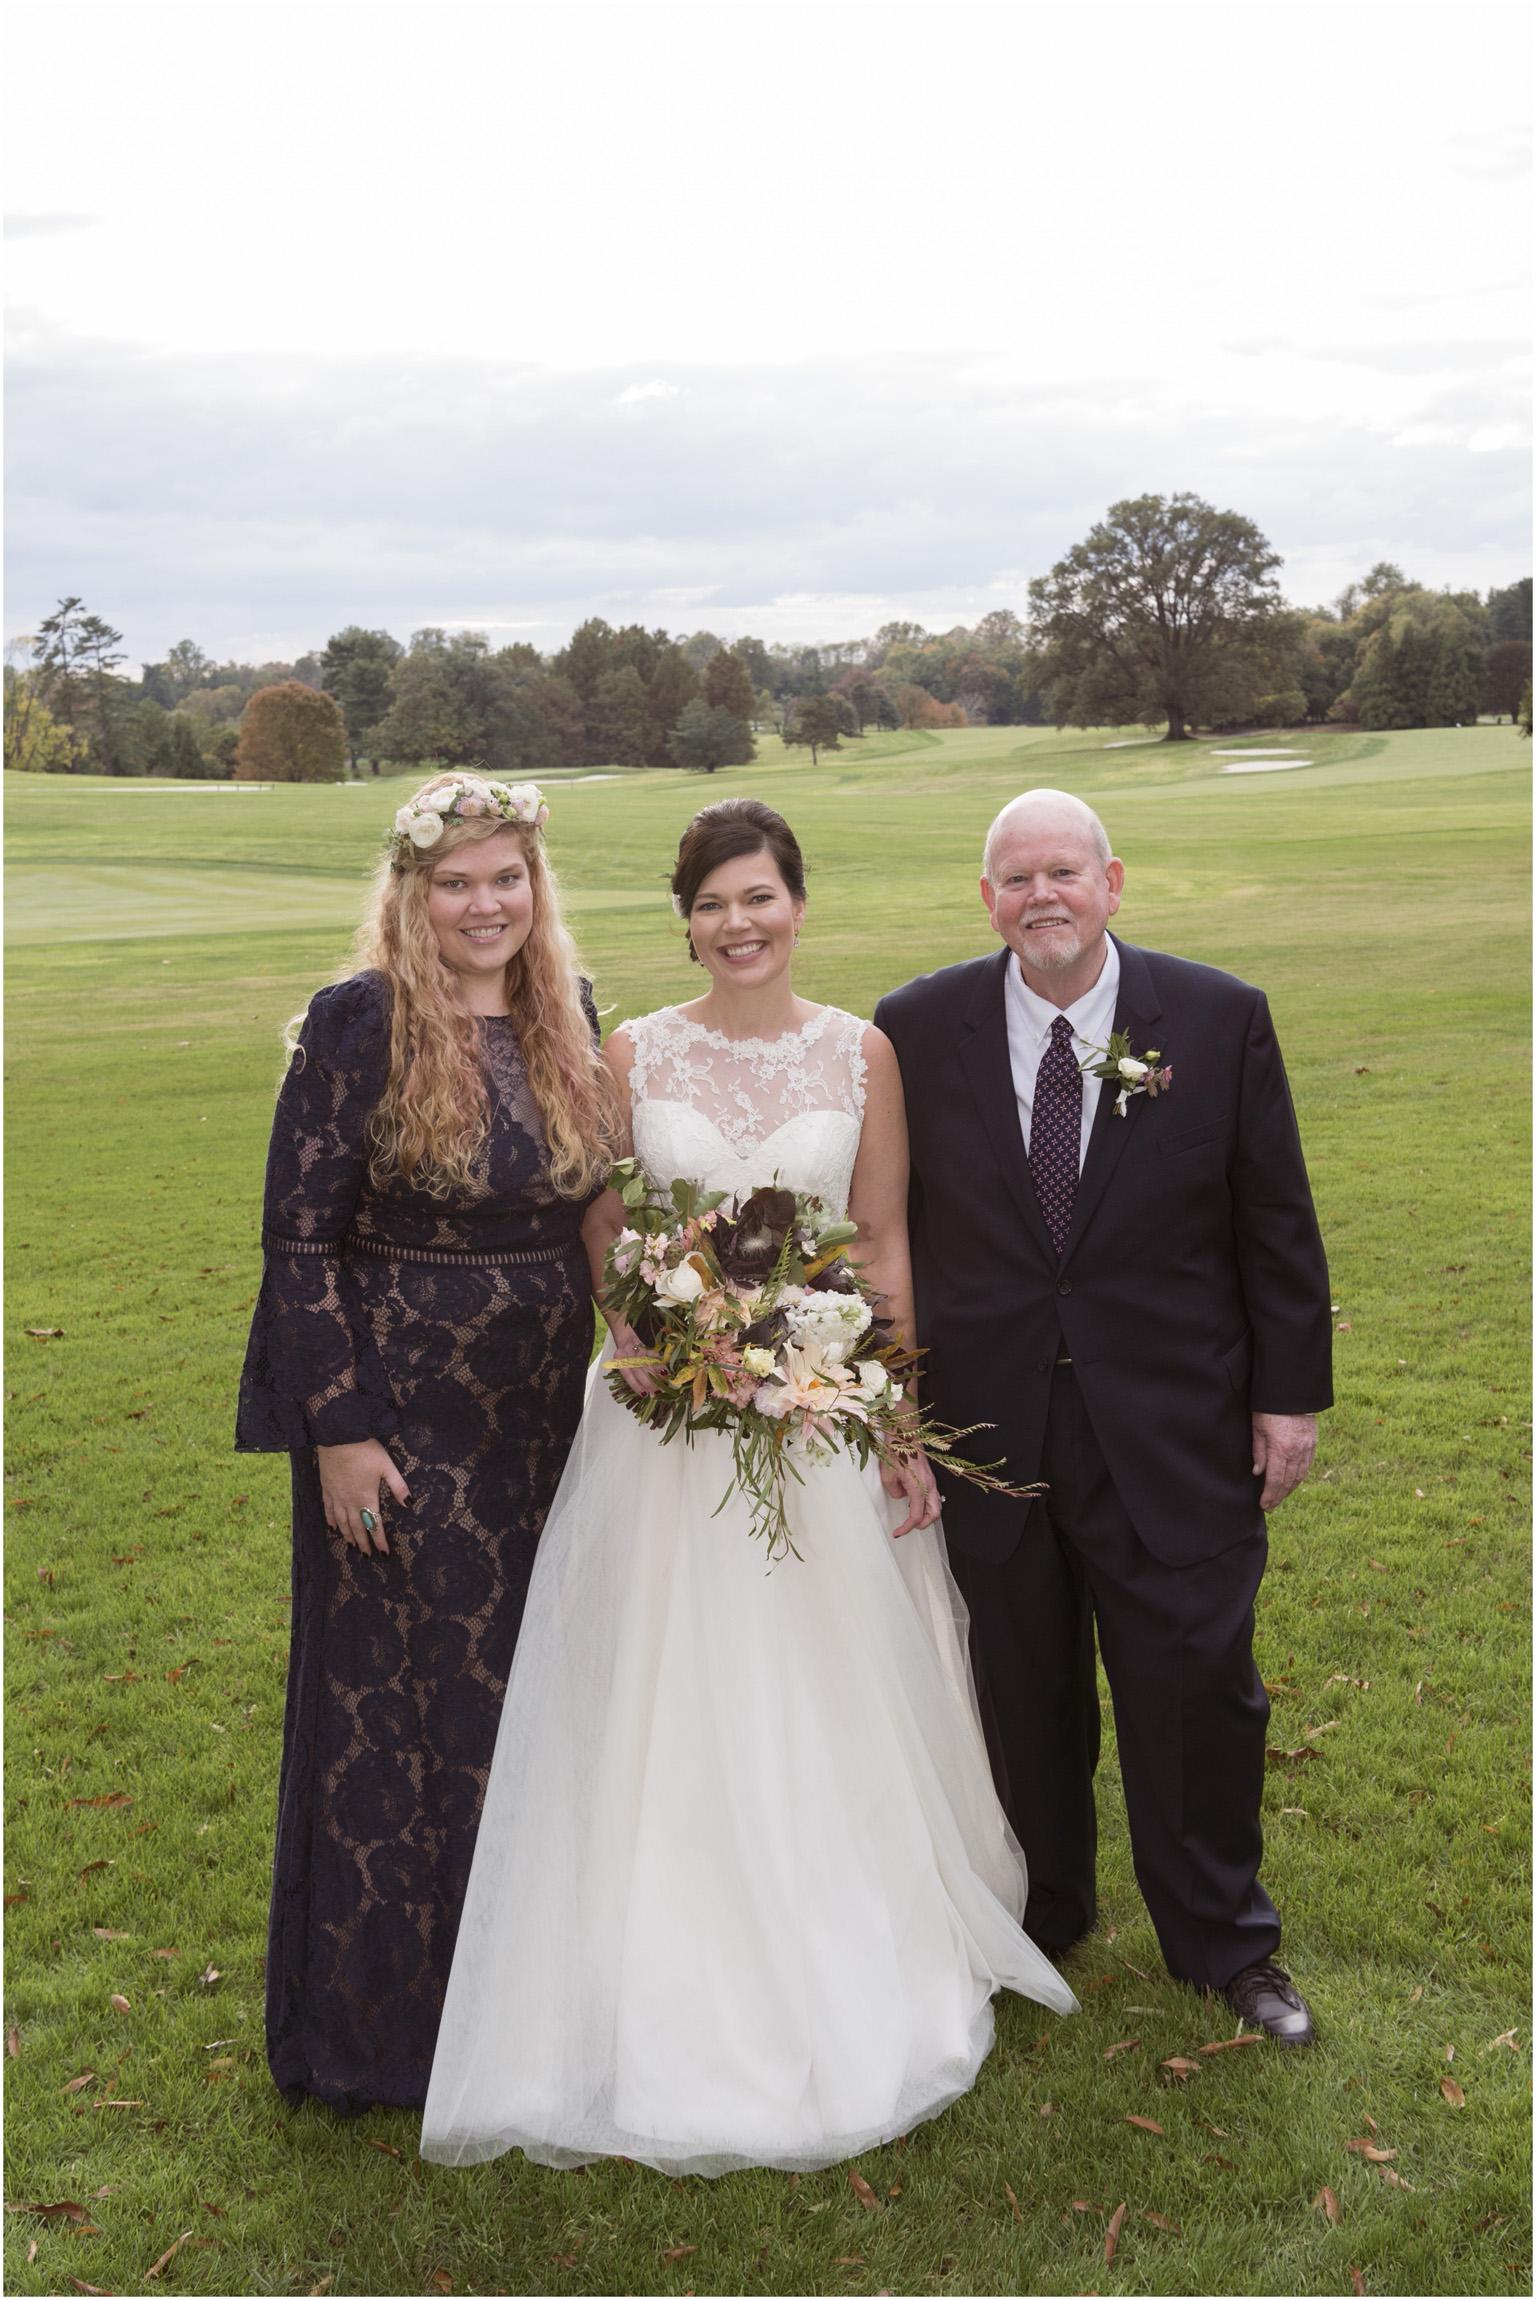 ©FianderFoto_Melissa_Mark_Wedding_Maryland_023.jpg